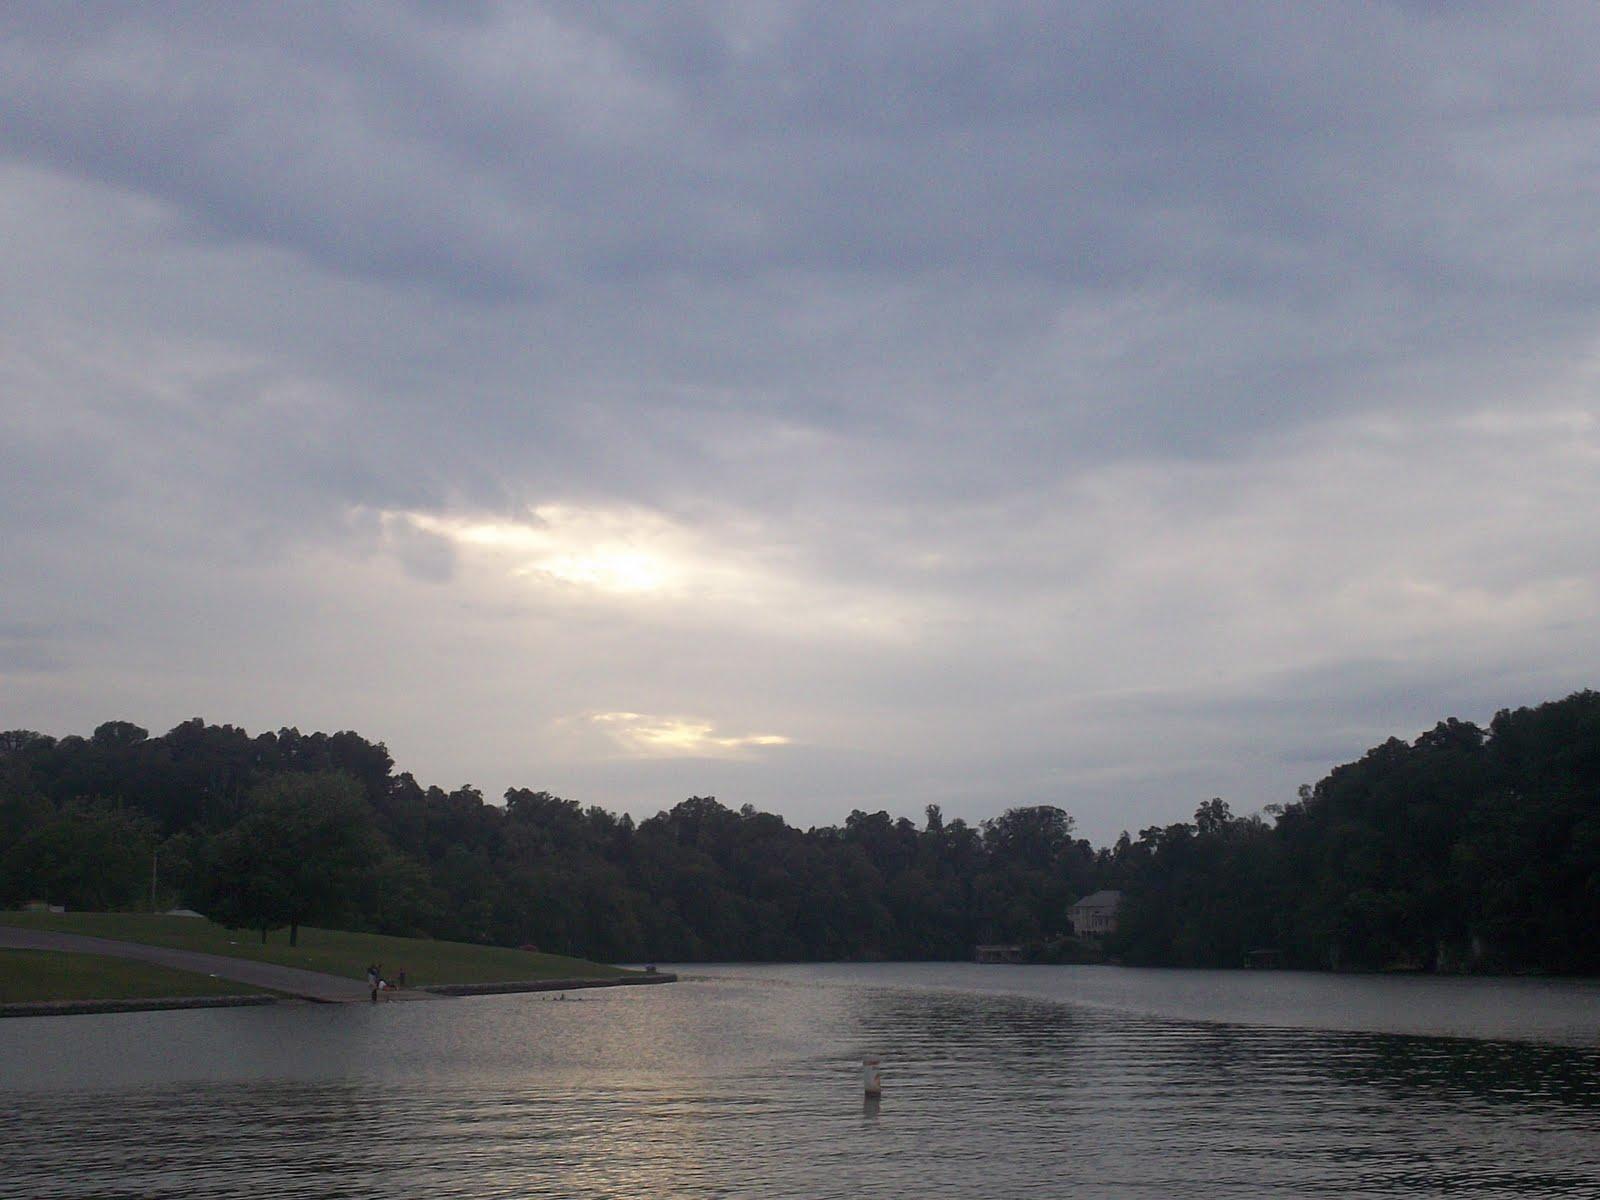 Tnvarmint night fishing on boone lake for Fishing in boone nc